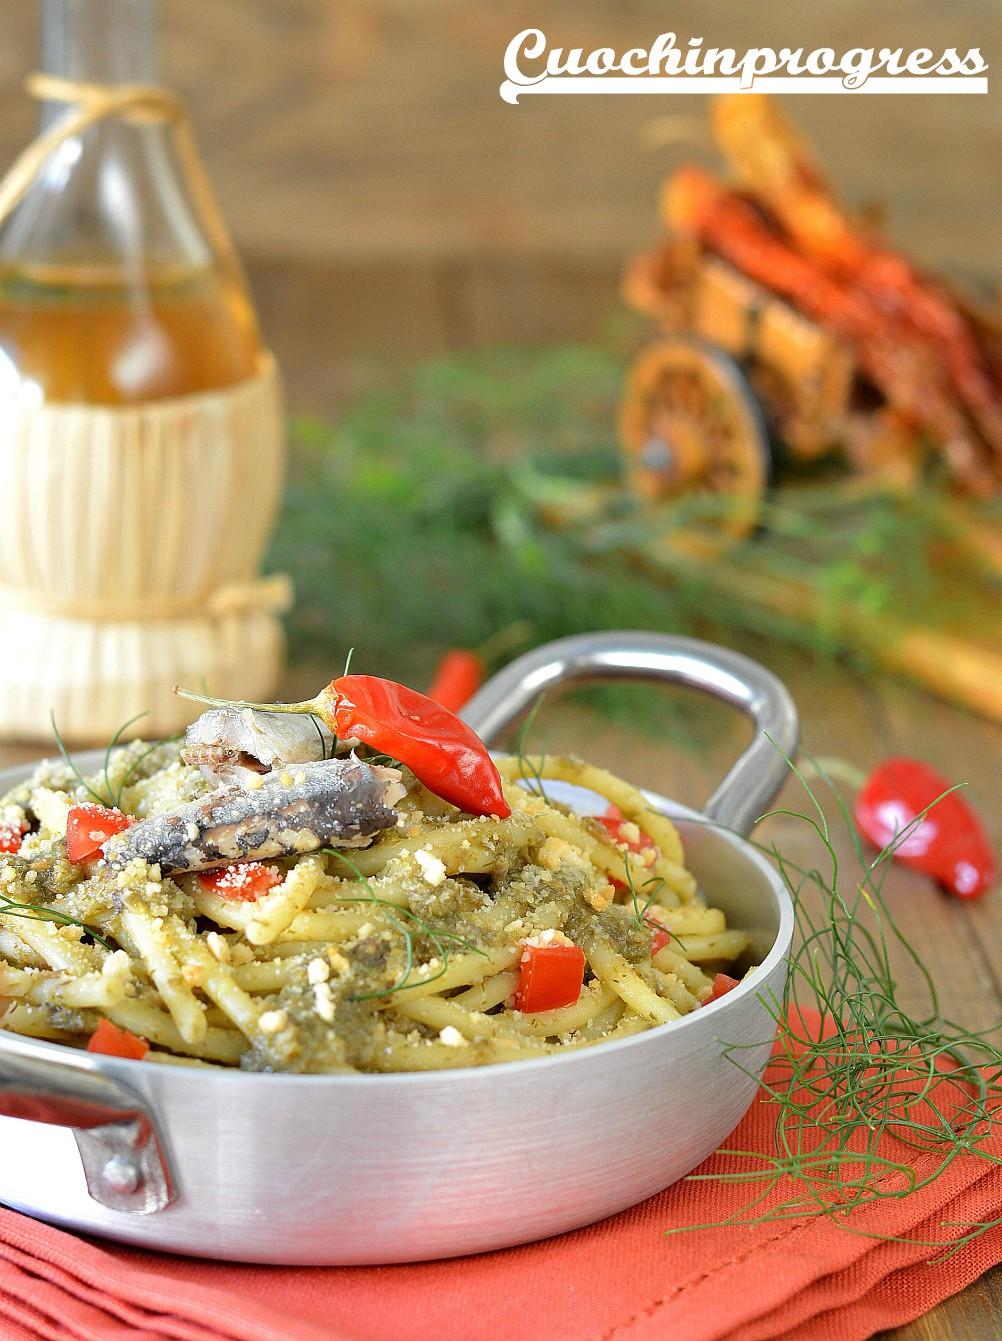 Sarde in saor ricetta tipica veneziana - Cucina tipica veneziana ...